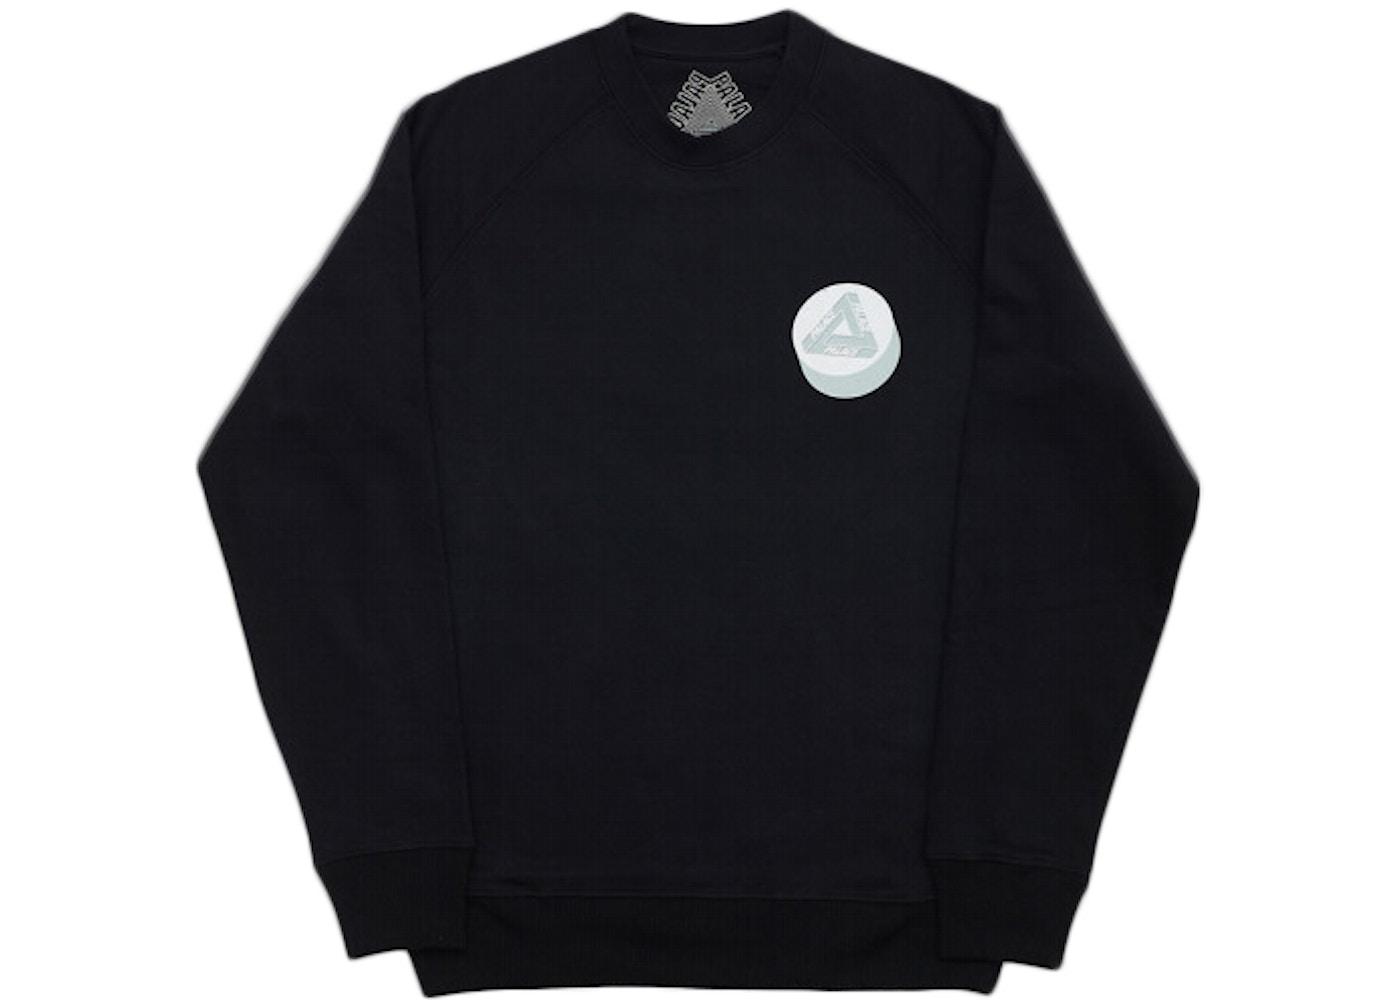 987ae1e04 Palace Tablet Crewneck Sweatshirt Black. Tablet Crewneck